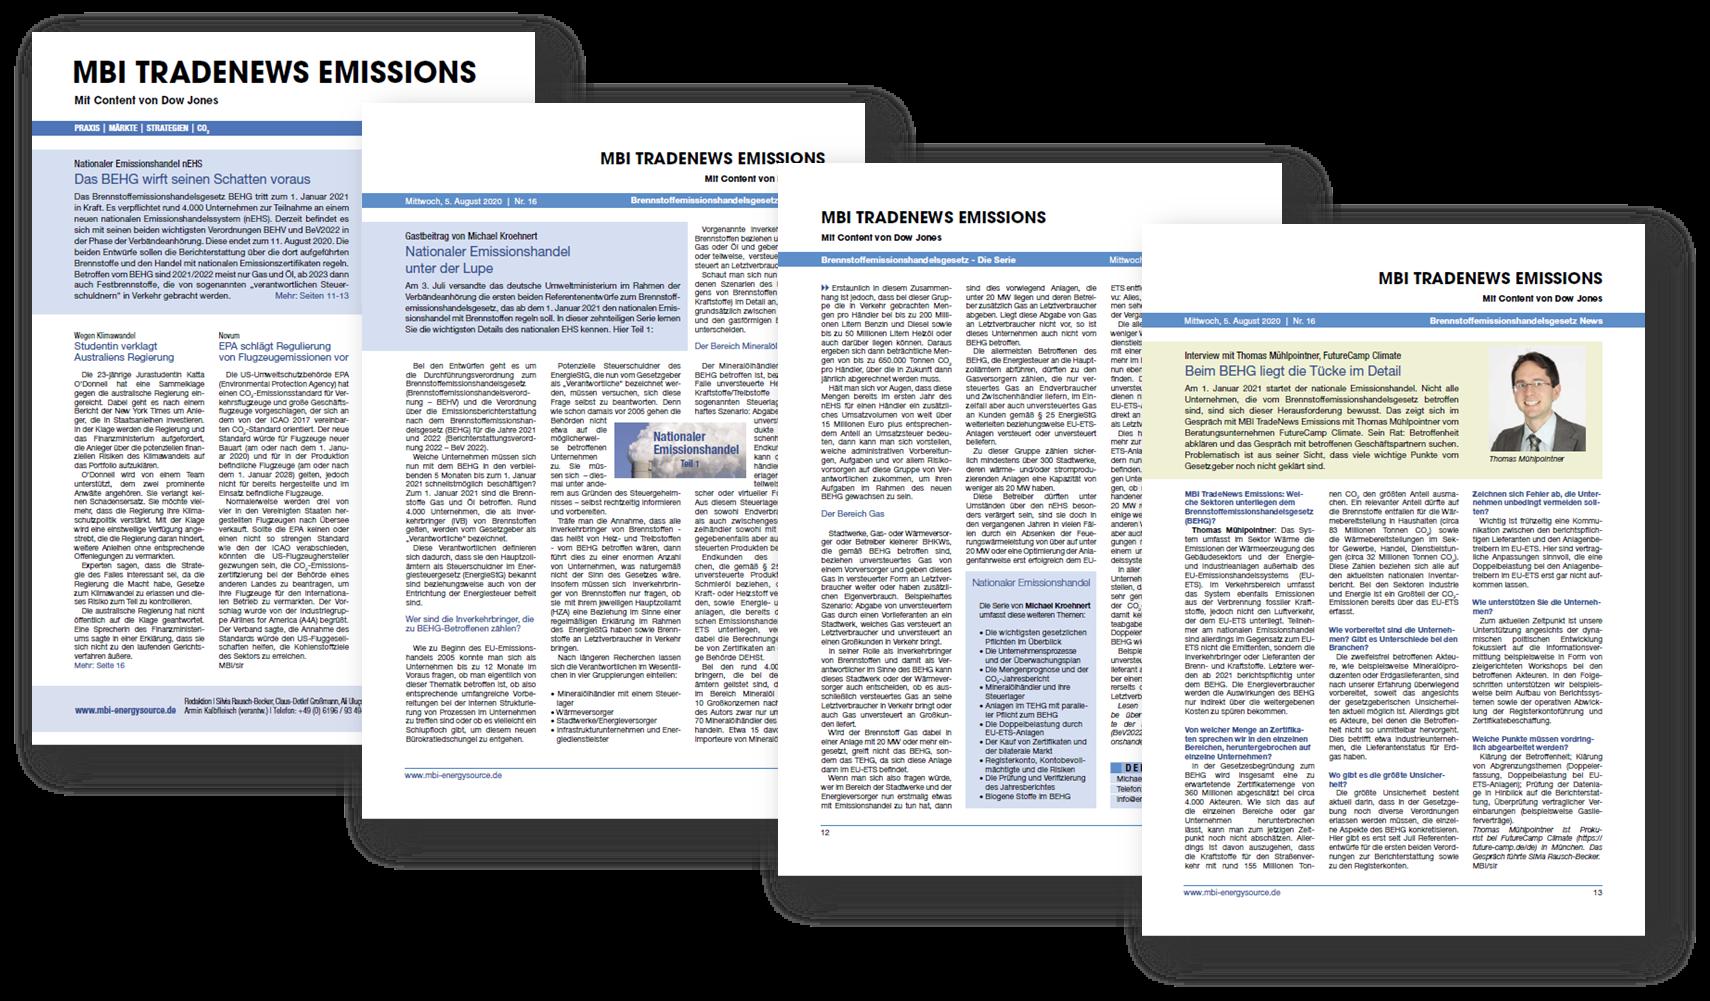 BEHG Brennstoffemissionshandelsgesetz Fachbuch | Screenshots | MBI Infosource